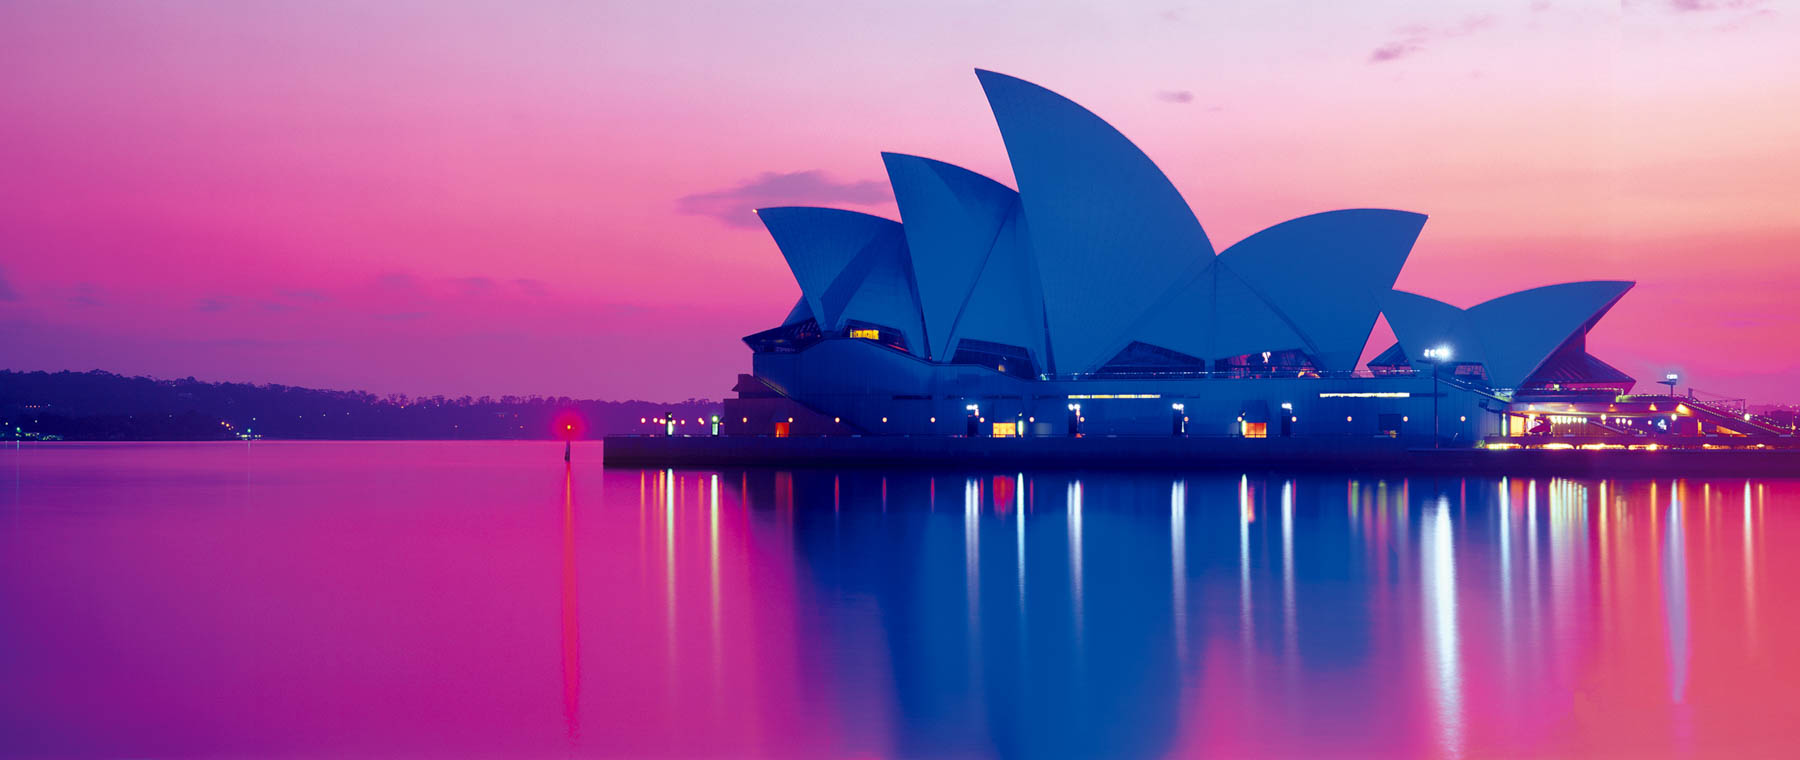 Sydney Sydney Opera House at DaybreakOpera House At Daybreak, NSW